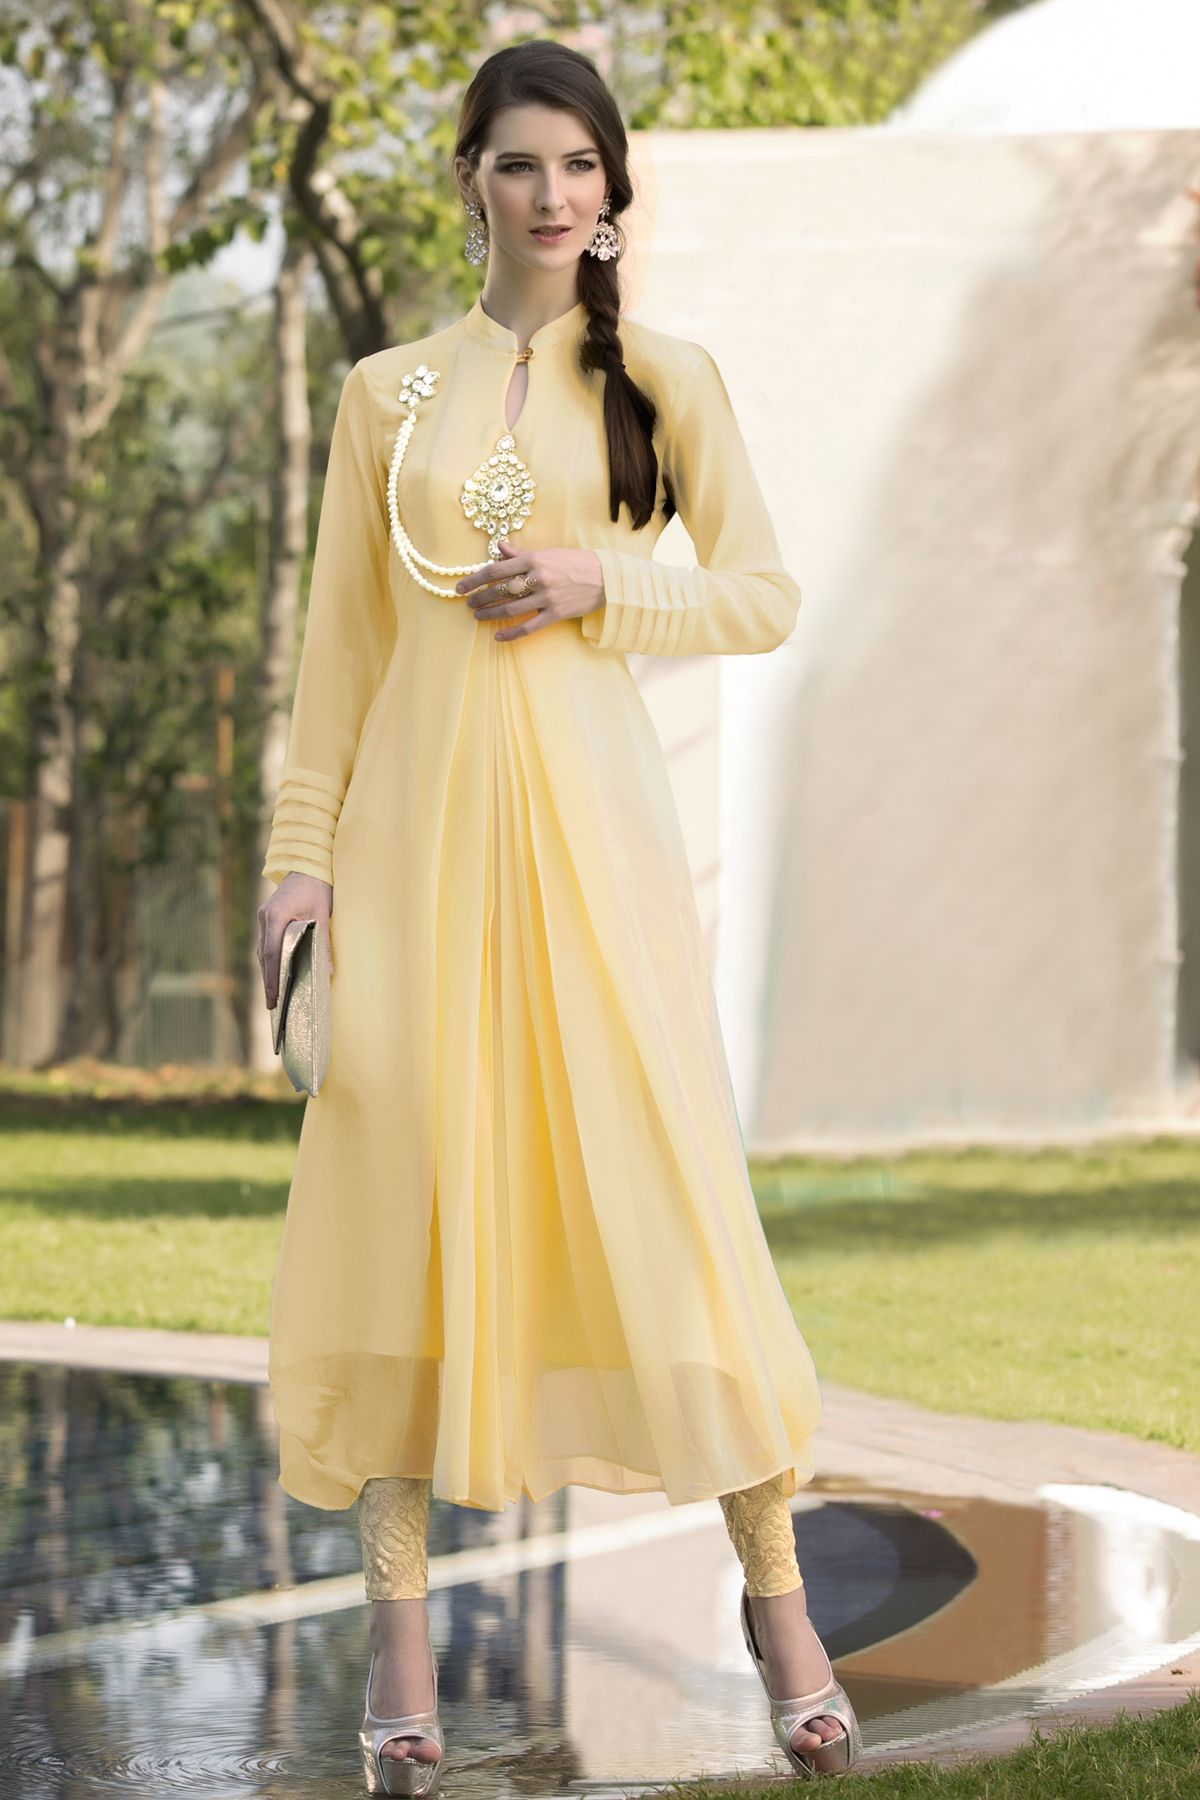 #designer #party #kurtis @ http://zohraa.com/cream-faux-georgette-kurti.html #celebrity #zohraa #onlineshop #womensfashion #womenswear #bollywood #look #diva #party #shopping #online #beautiful #beauty #glam #shoppingonline #styles #stylish #model #fashionista #women #lifestyle #fashion #original #products #saynotoreplicas